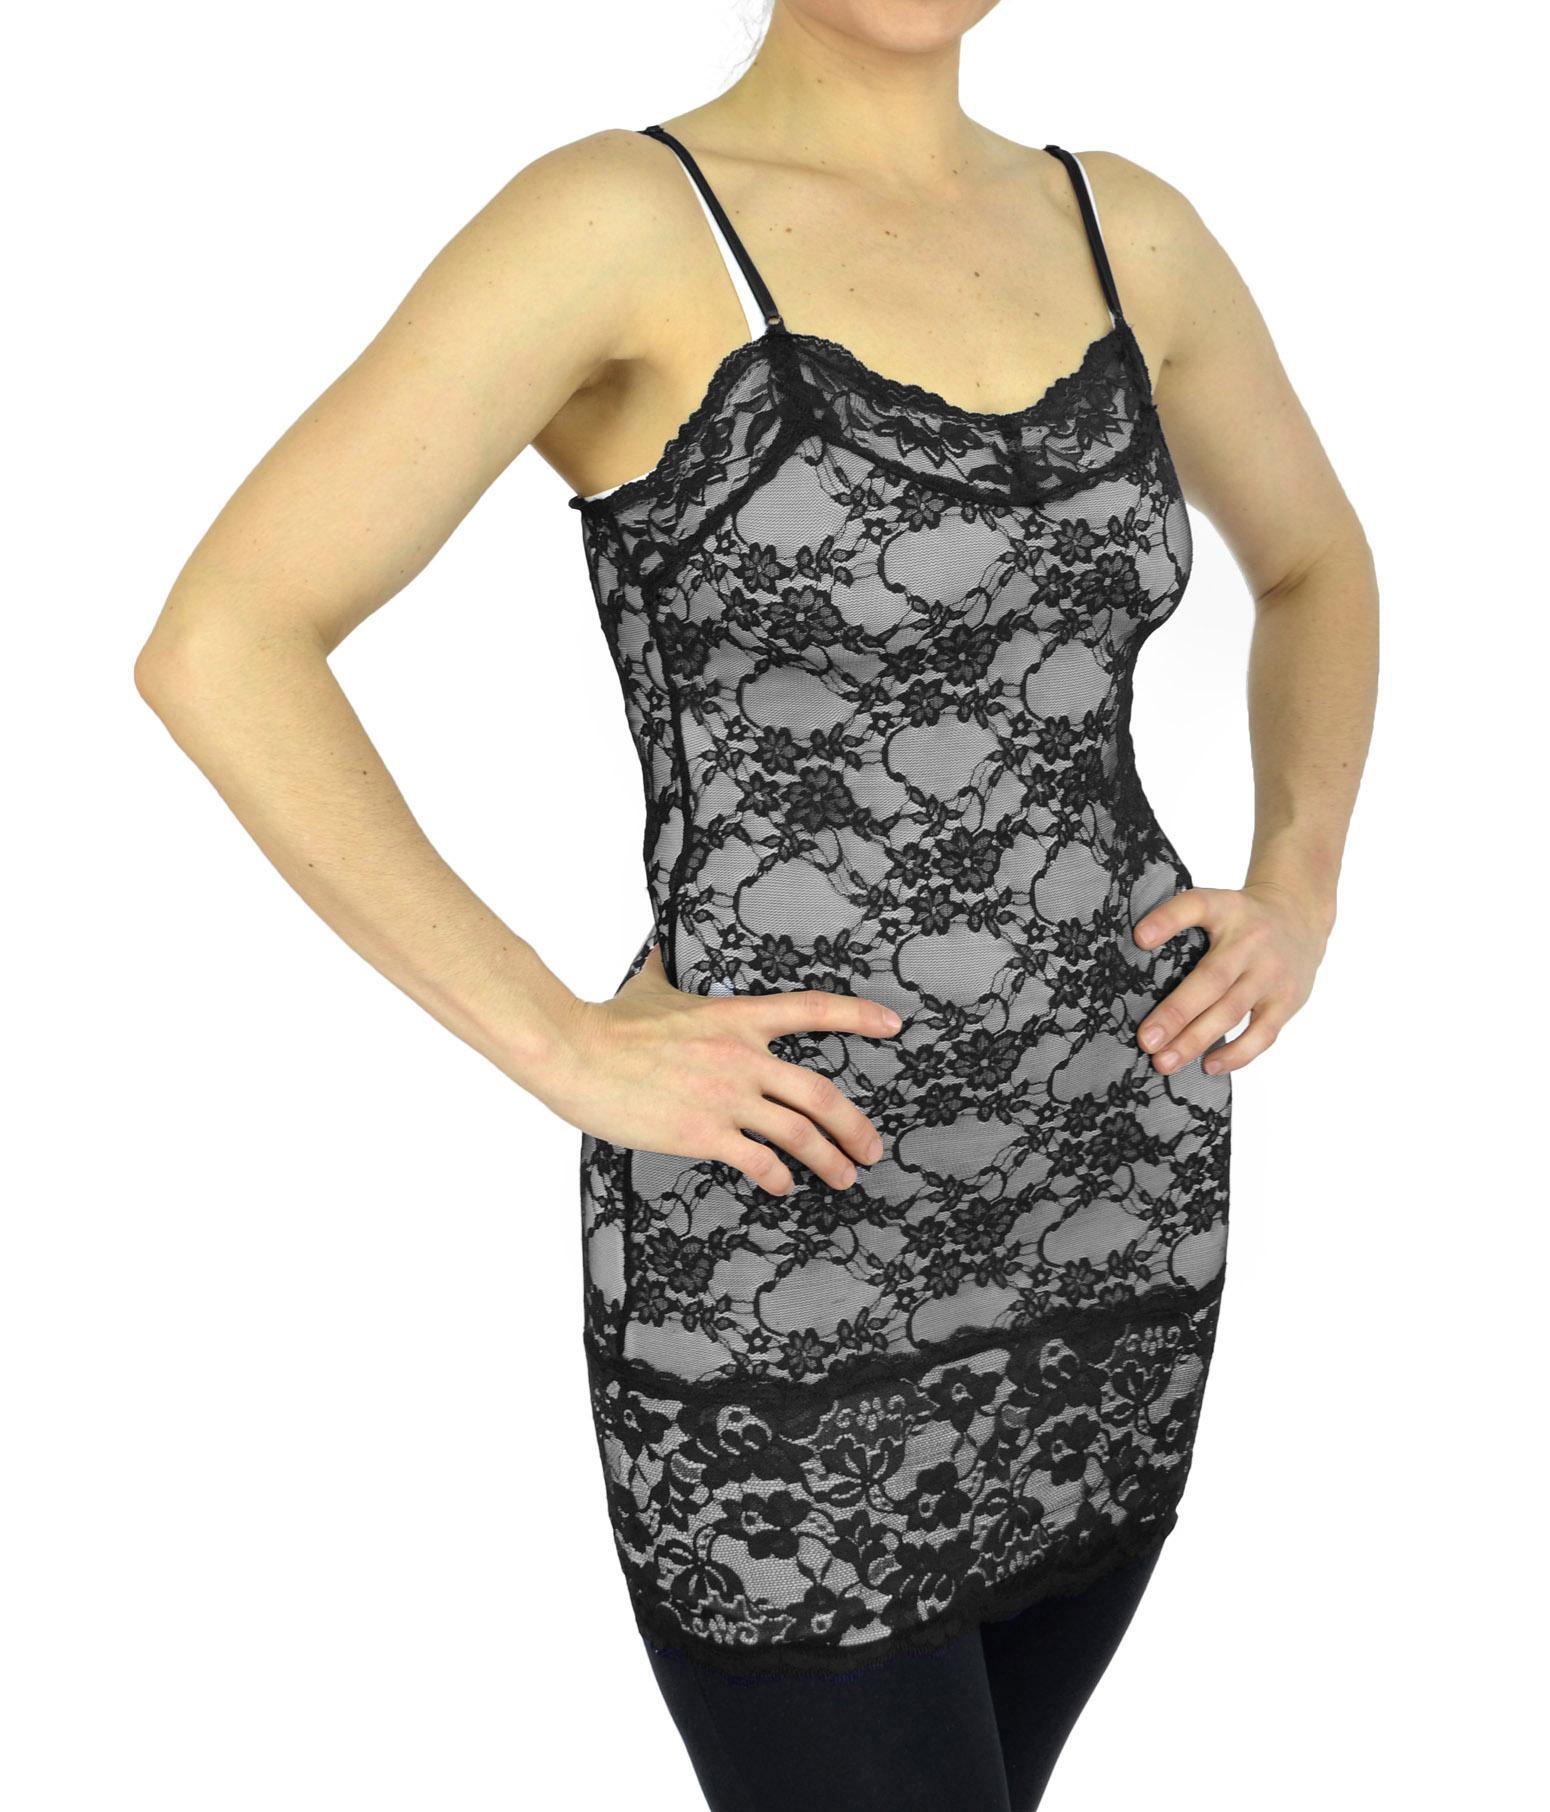 Belle Donne - Womens Tank top Cami Top Spaghetti Strap Lace Camisole Tank Top - Dark Prada/Small